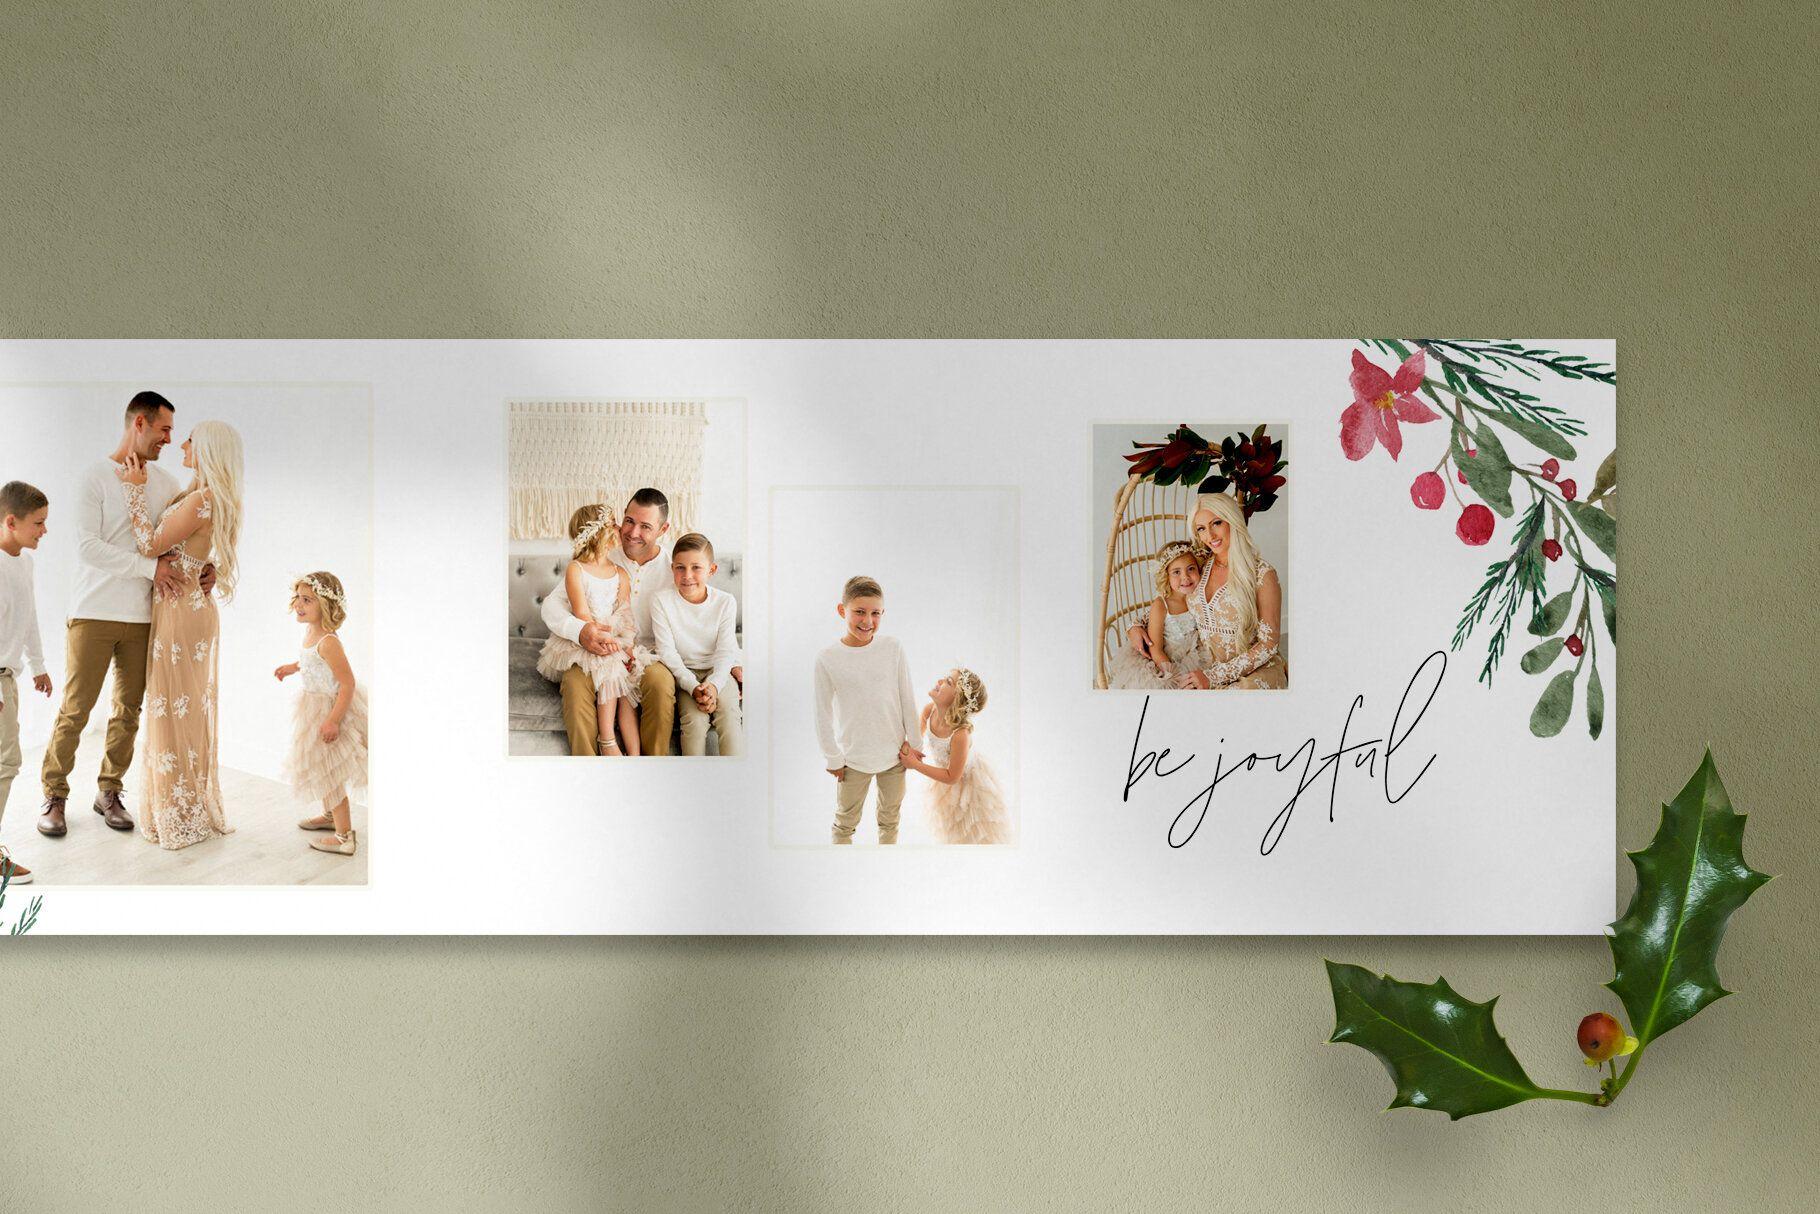 Christmas 5x5 Trifold Card Design Photoshop Templates For Photographers By Stephanie Design Christmas Photo Card Template Photoshop Template Design Card Design